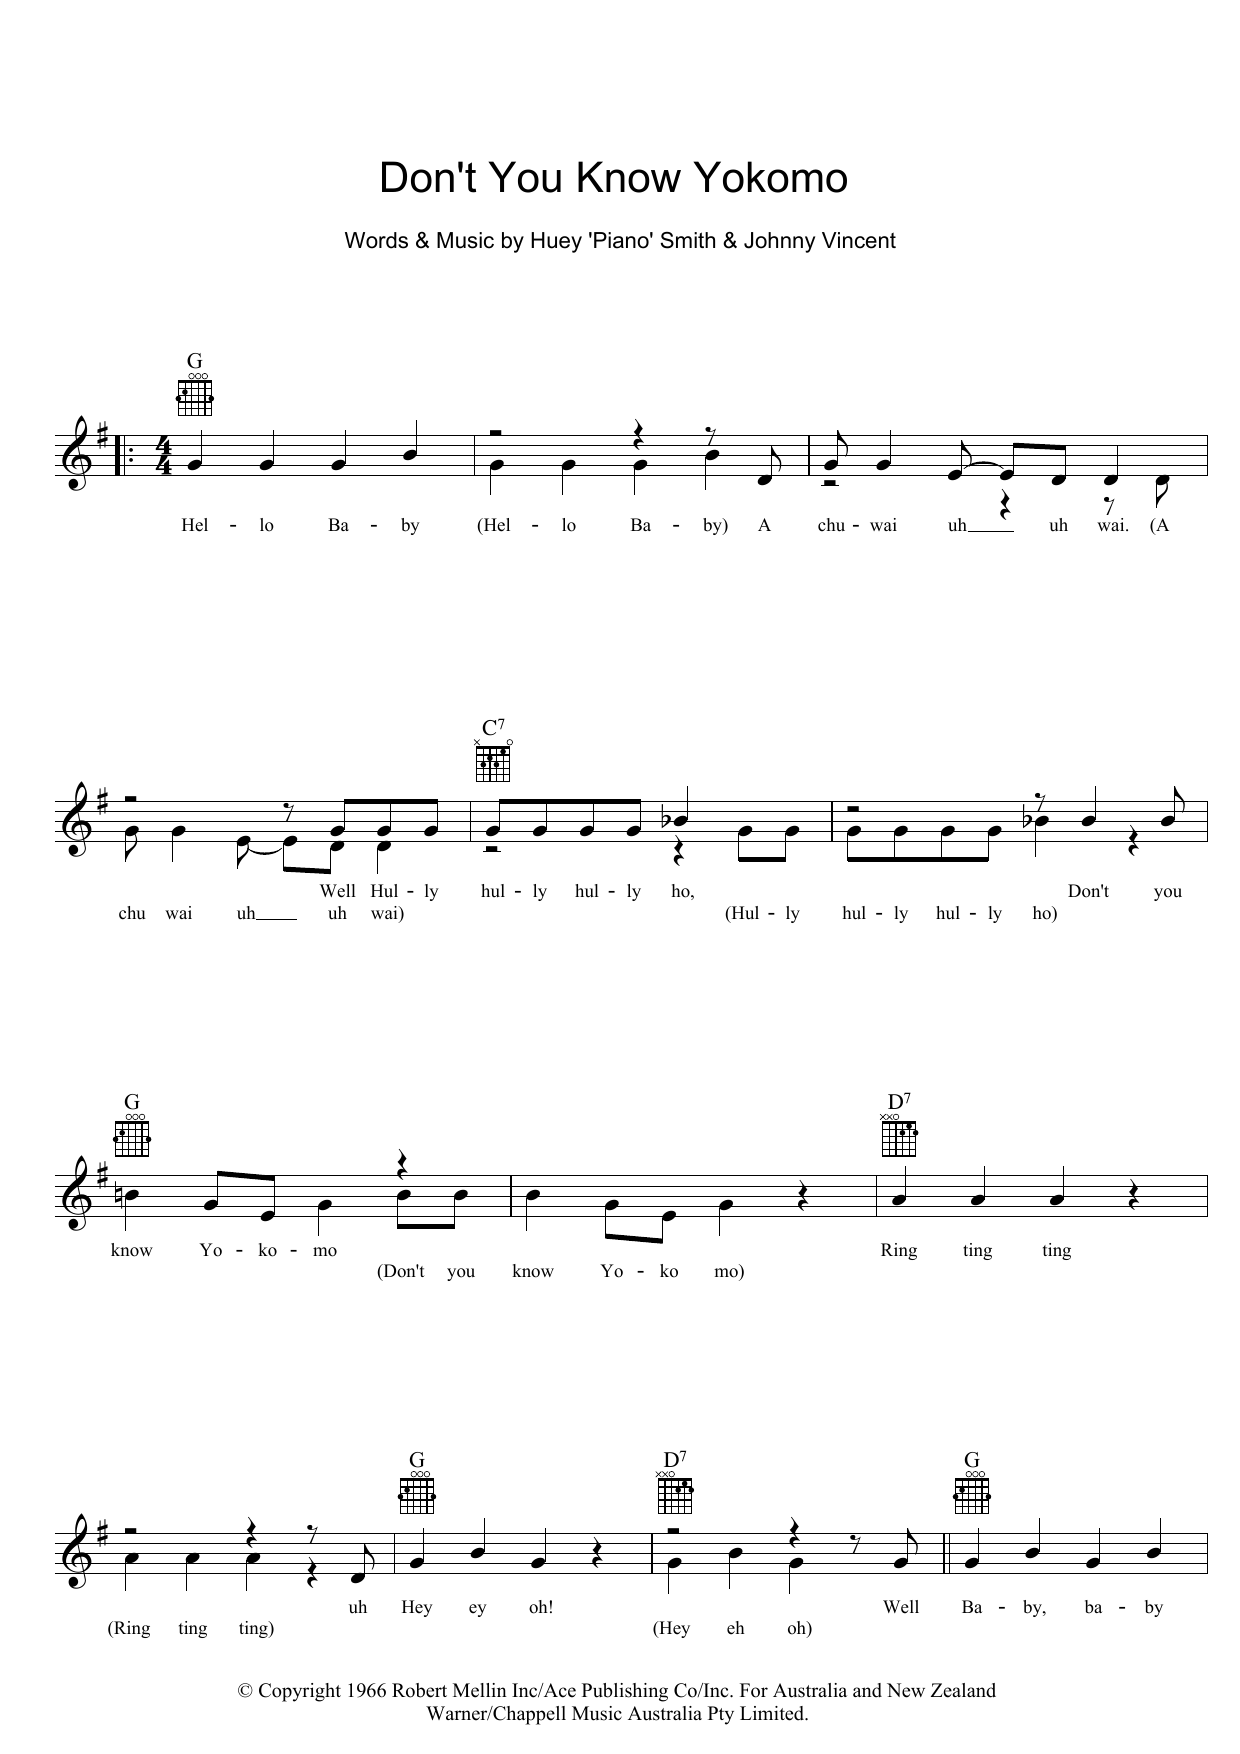 Don't You Know Yokomo Sheet Music